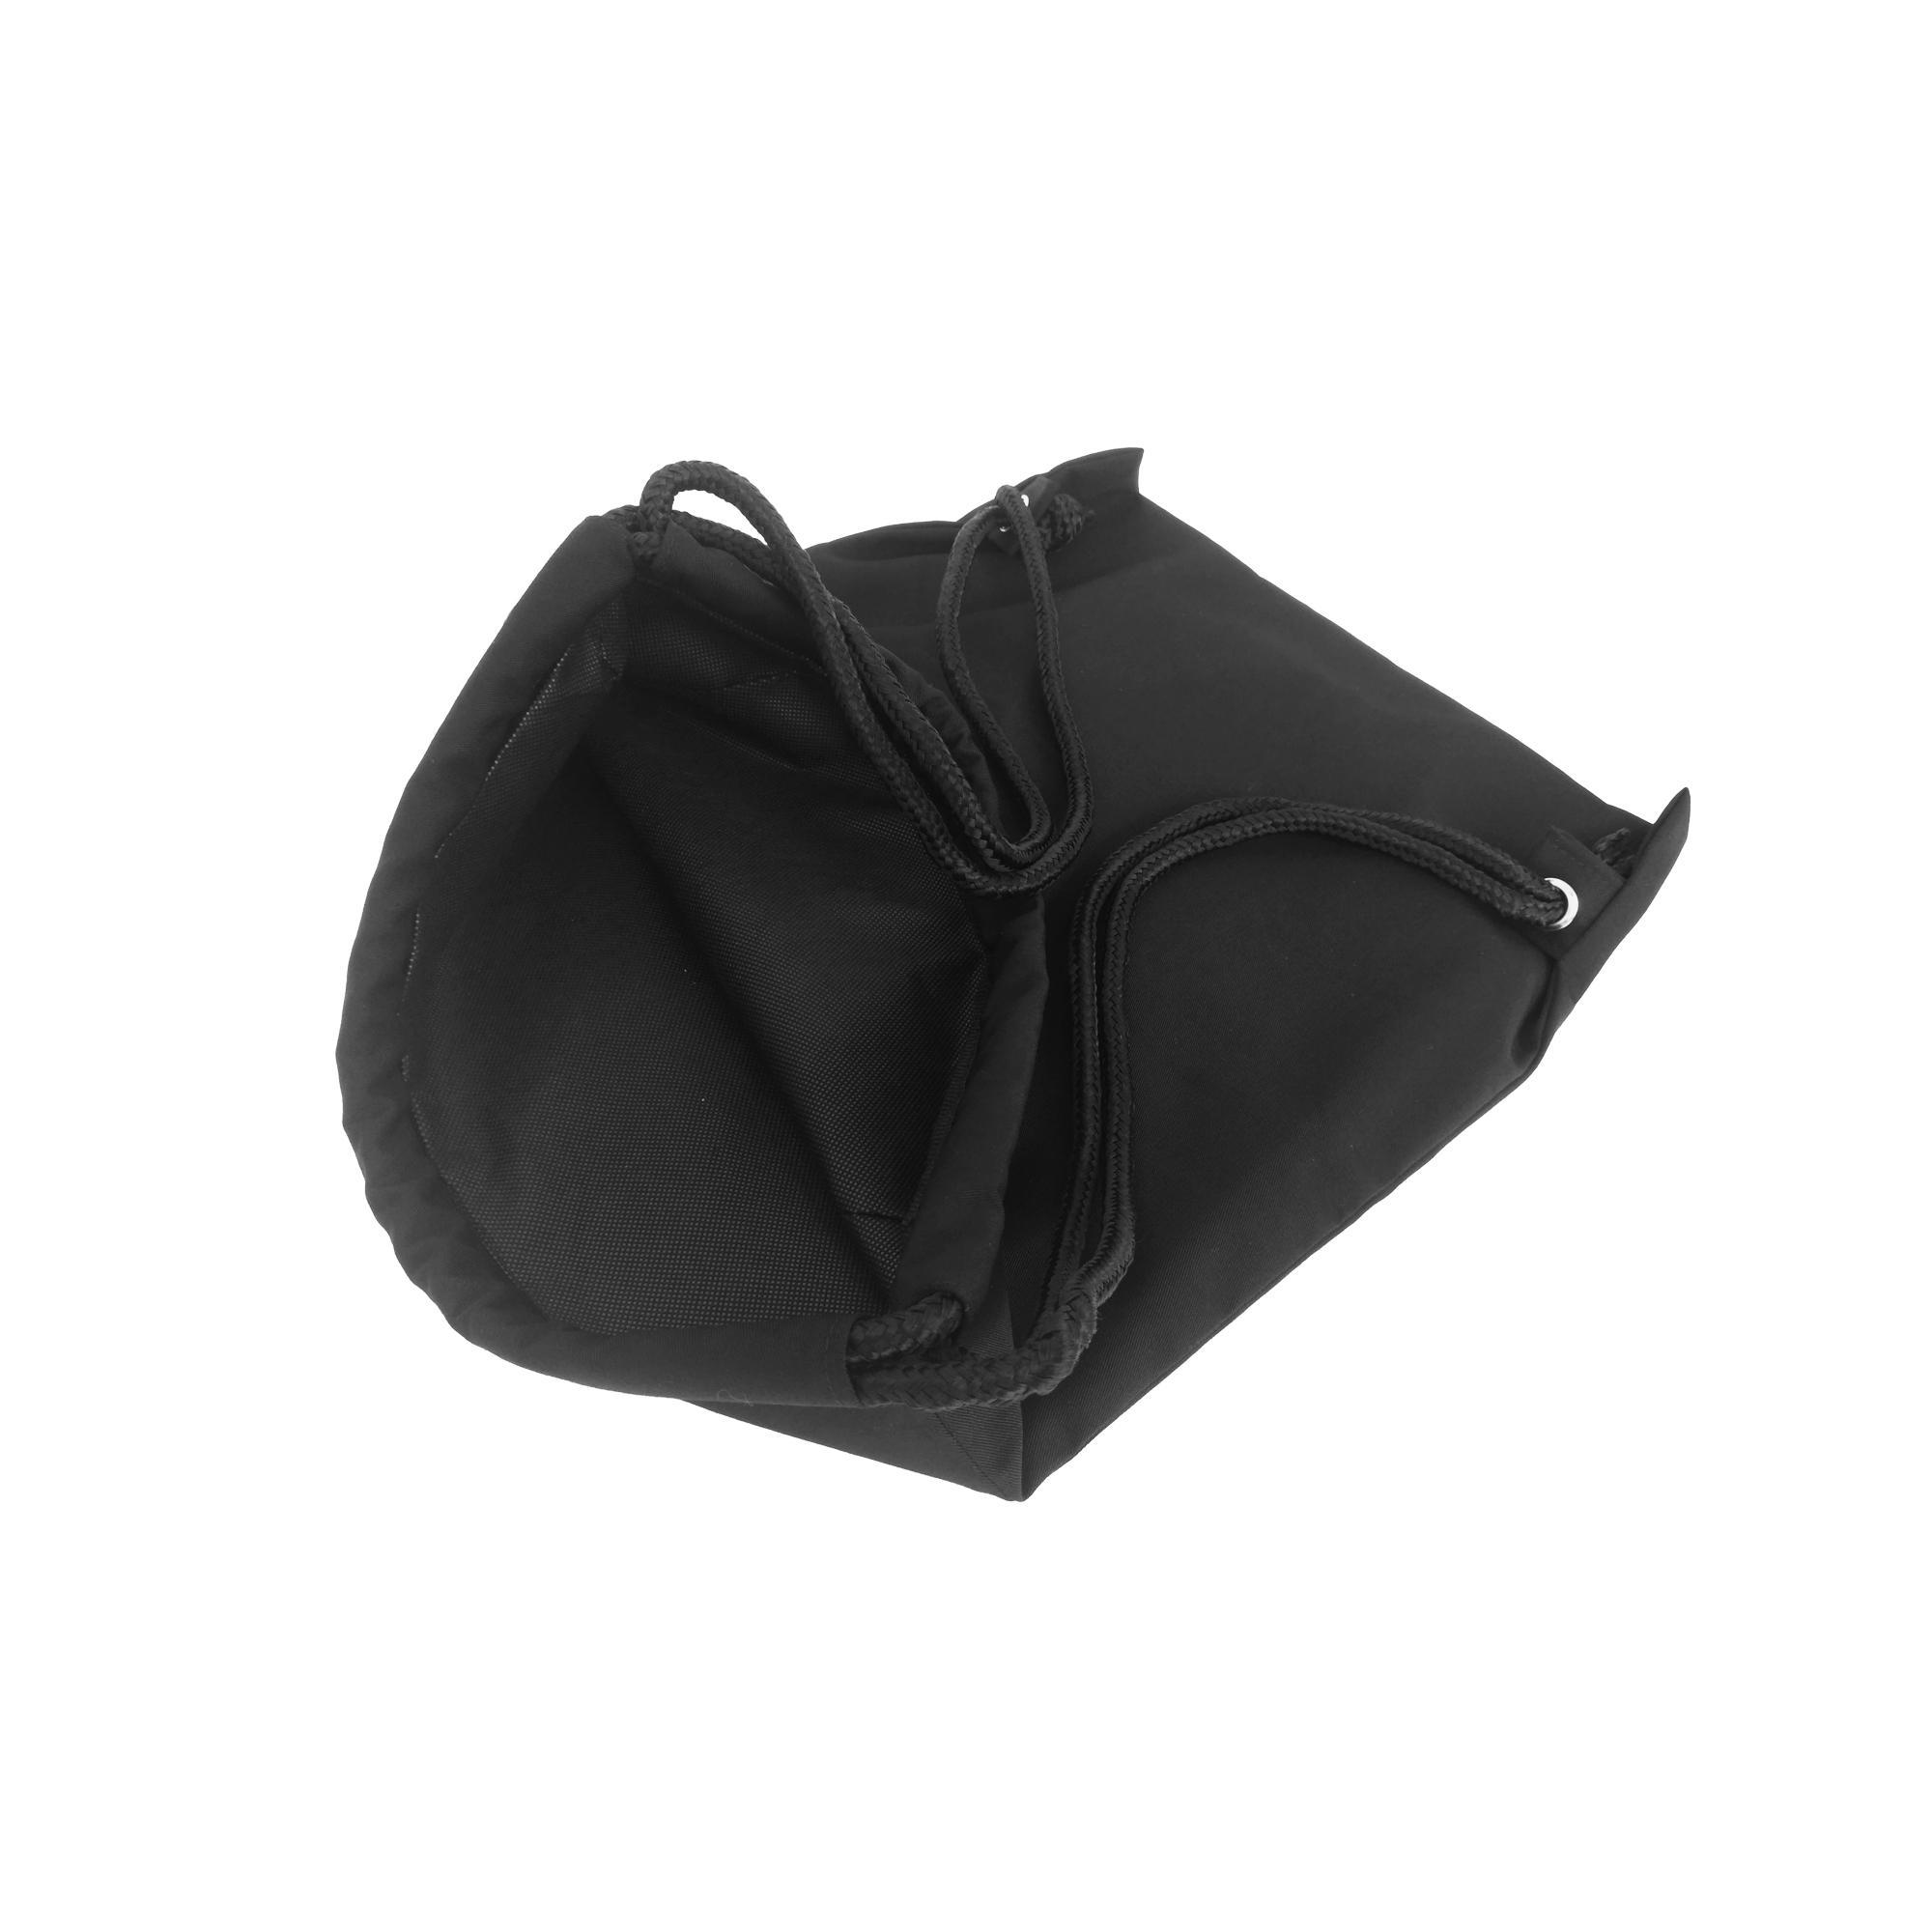 99630f269e67 Detail Gambar tas ransel stringbag   string bag   tas serut - just do it  Terbaru